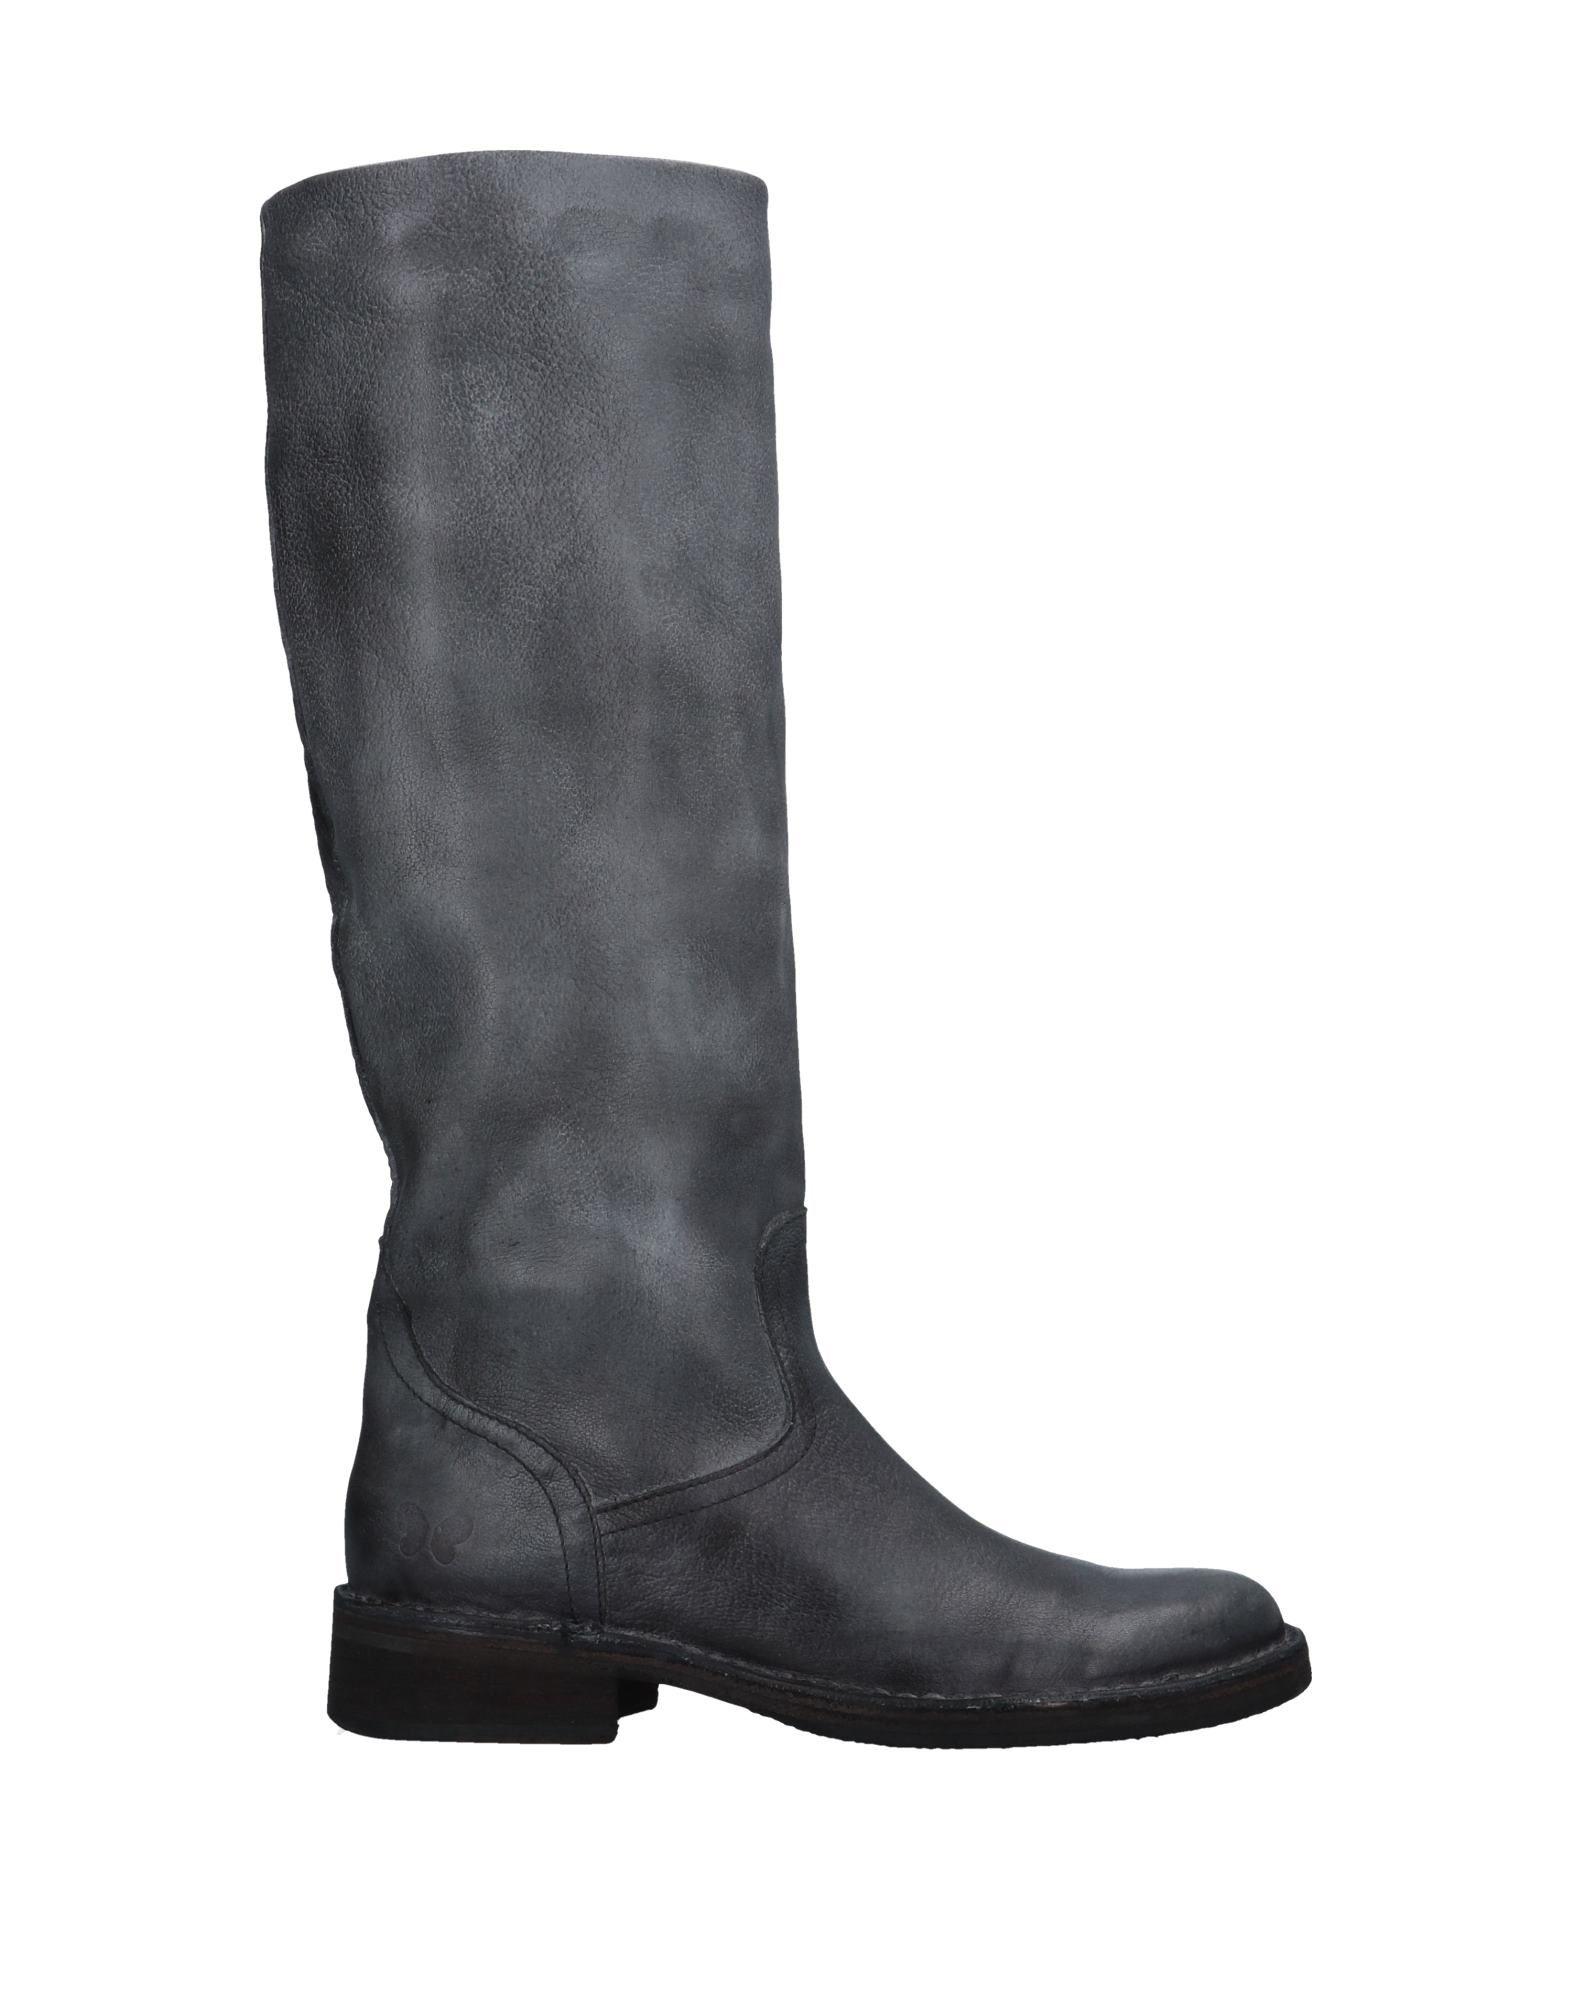 Felmini Stiefel Damen  11532239NA Gute Qualität beliebte Schuhe